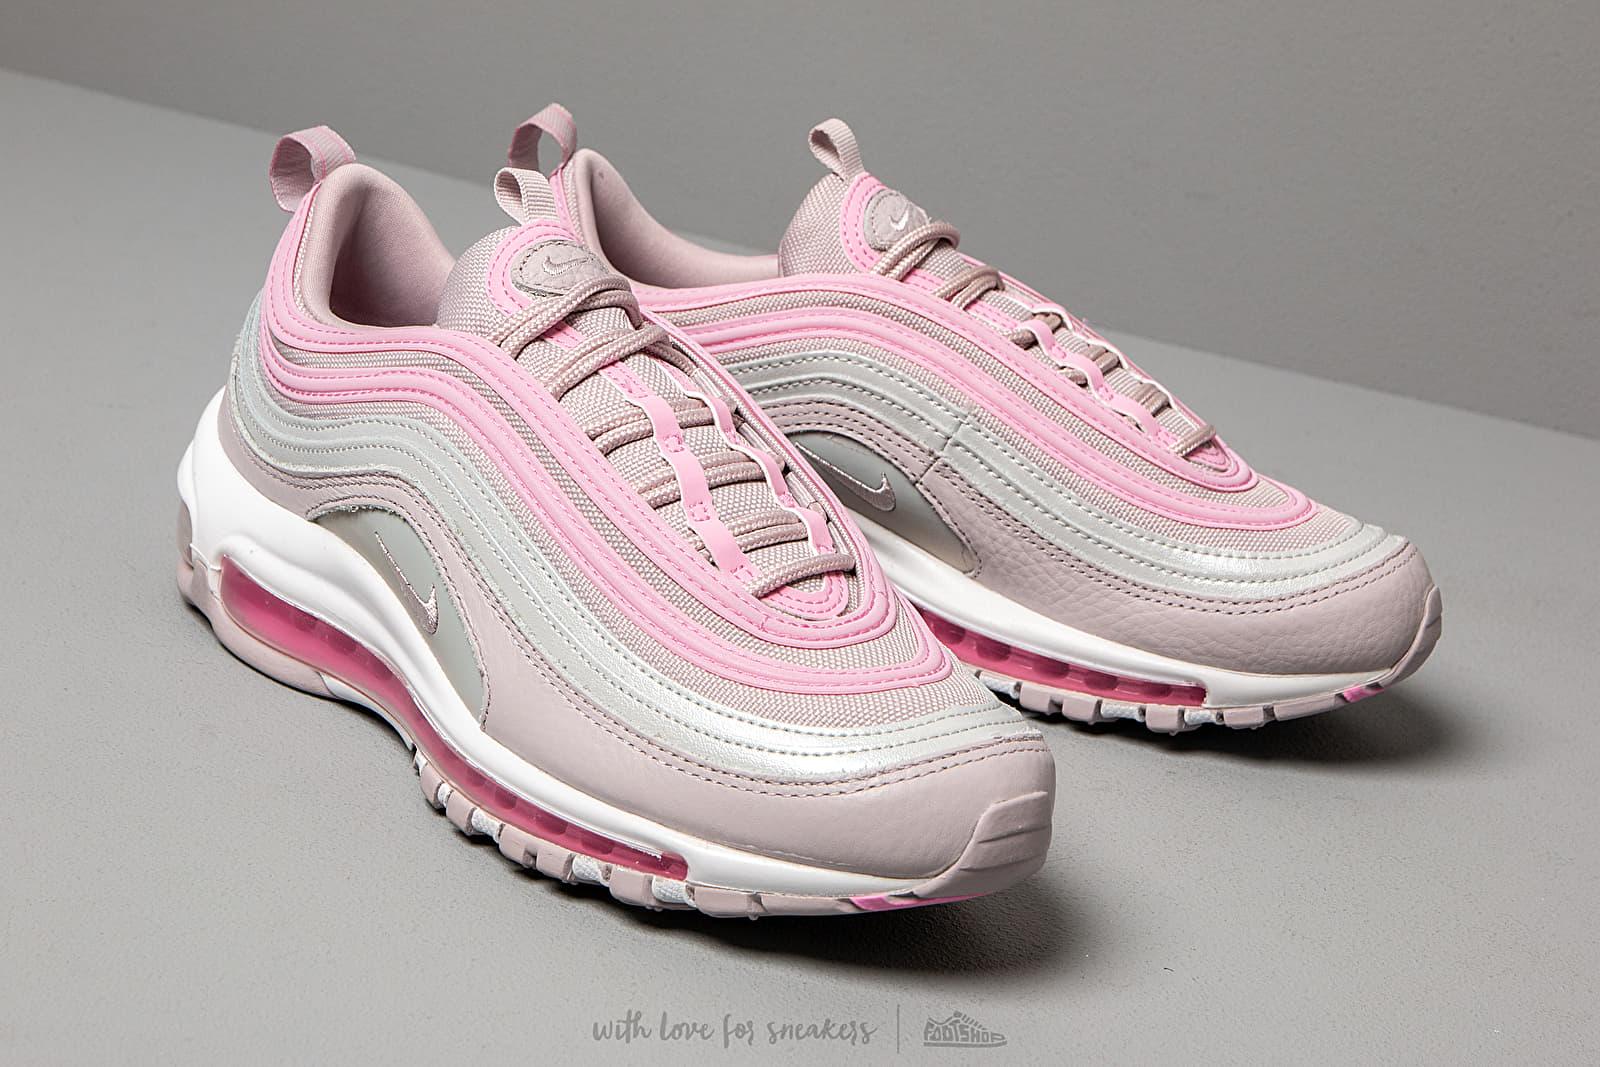 Nike W Air Max 97 LX Violet Ash Violet Ash Pink Rise White | Footshop